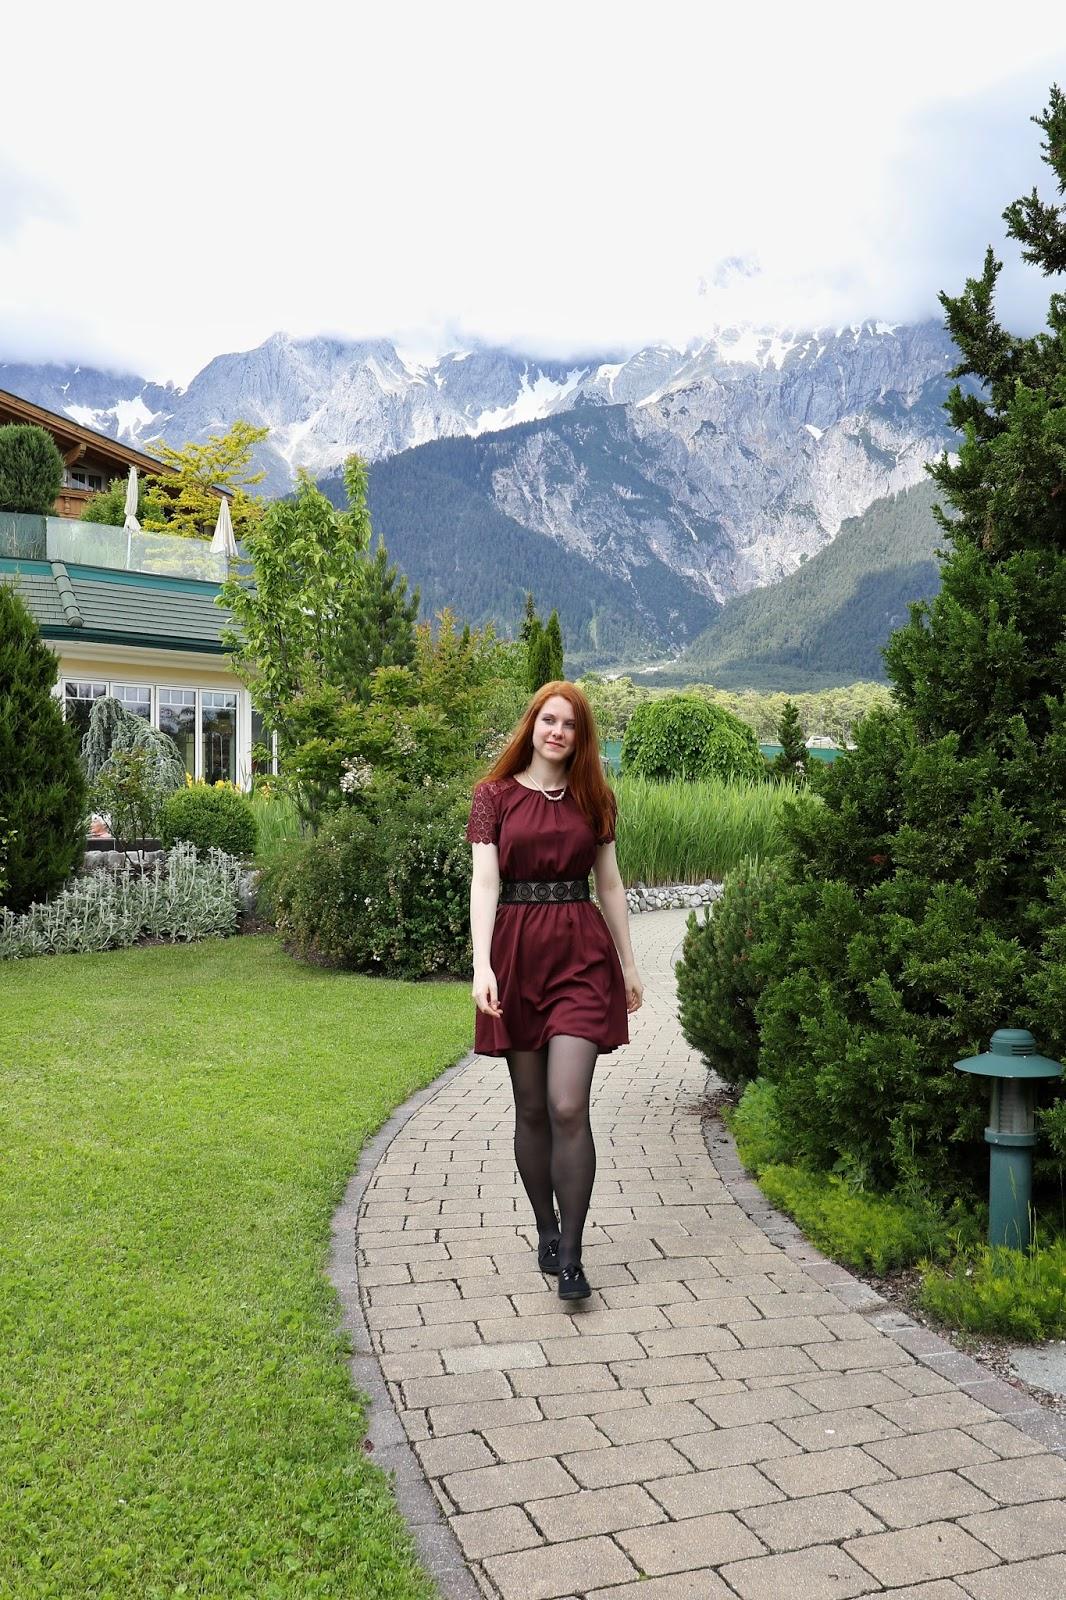 hotel schwarz, alpenresort schwarz, style without limits, tirol